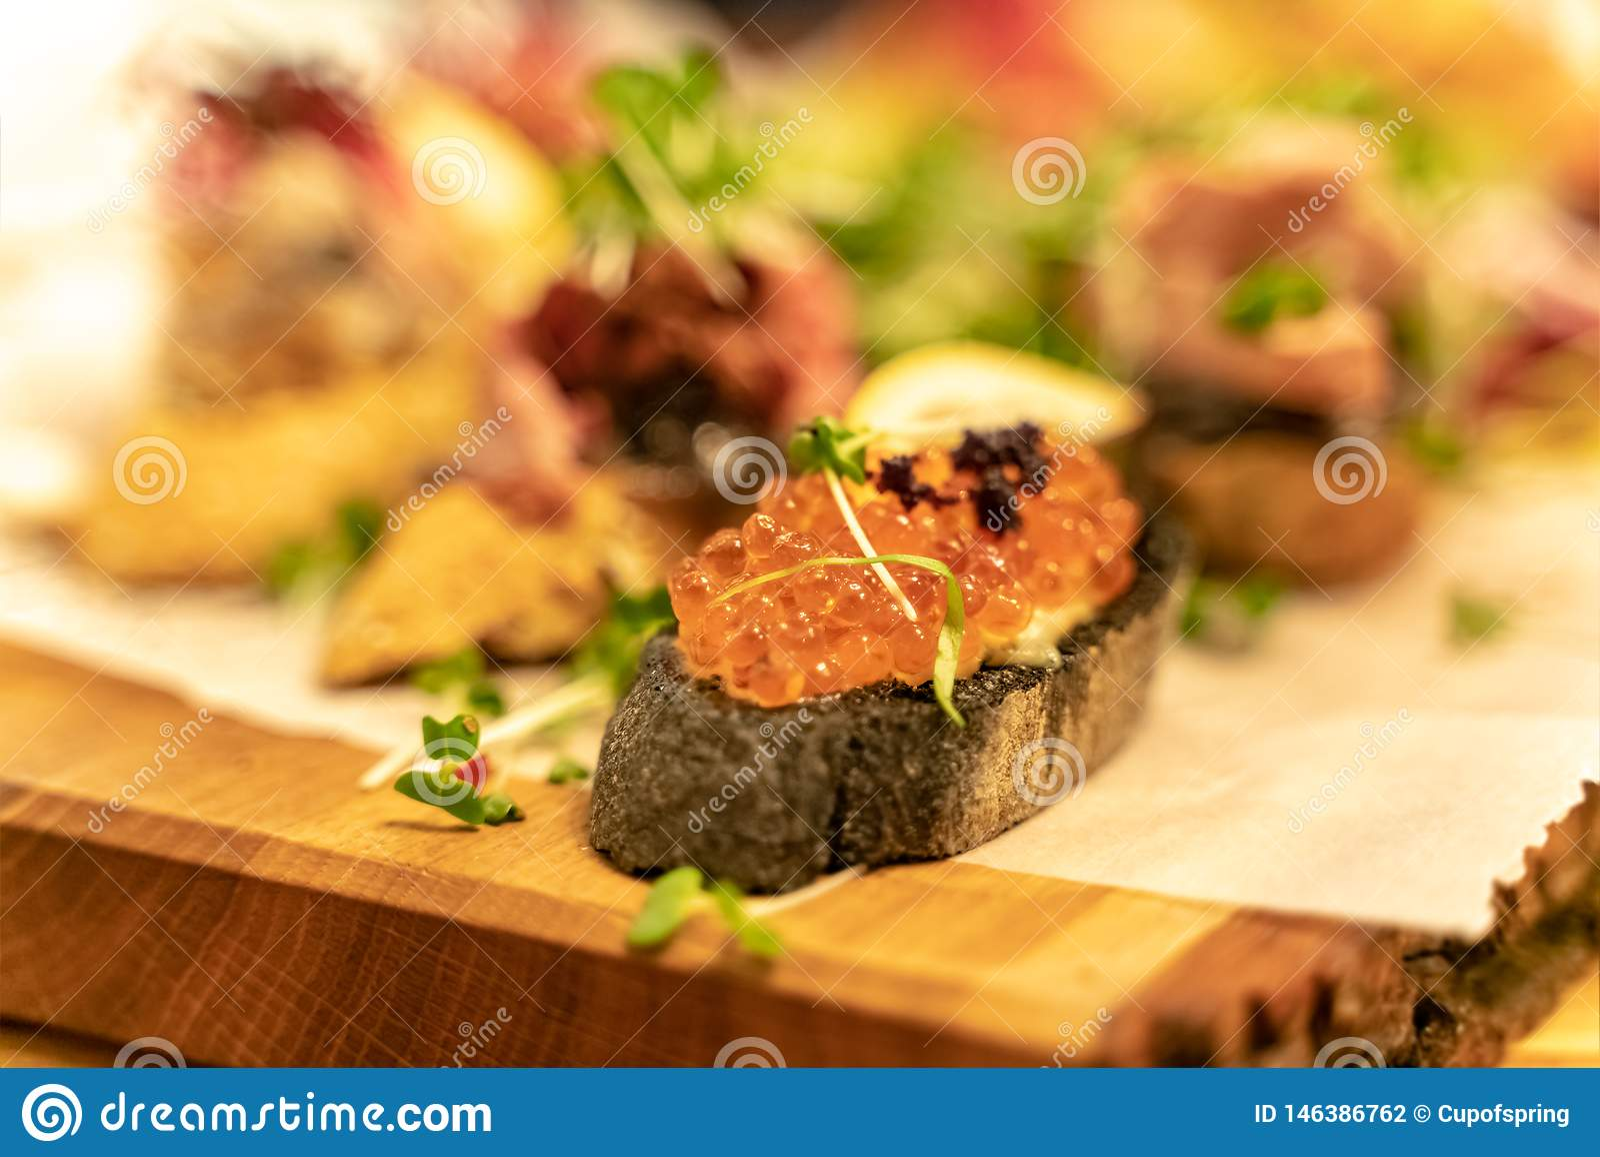 Caviar antipasti wine snacks set with Shallow depth of focus over dark grunge background